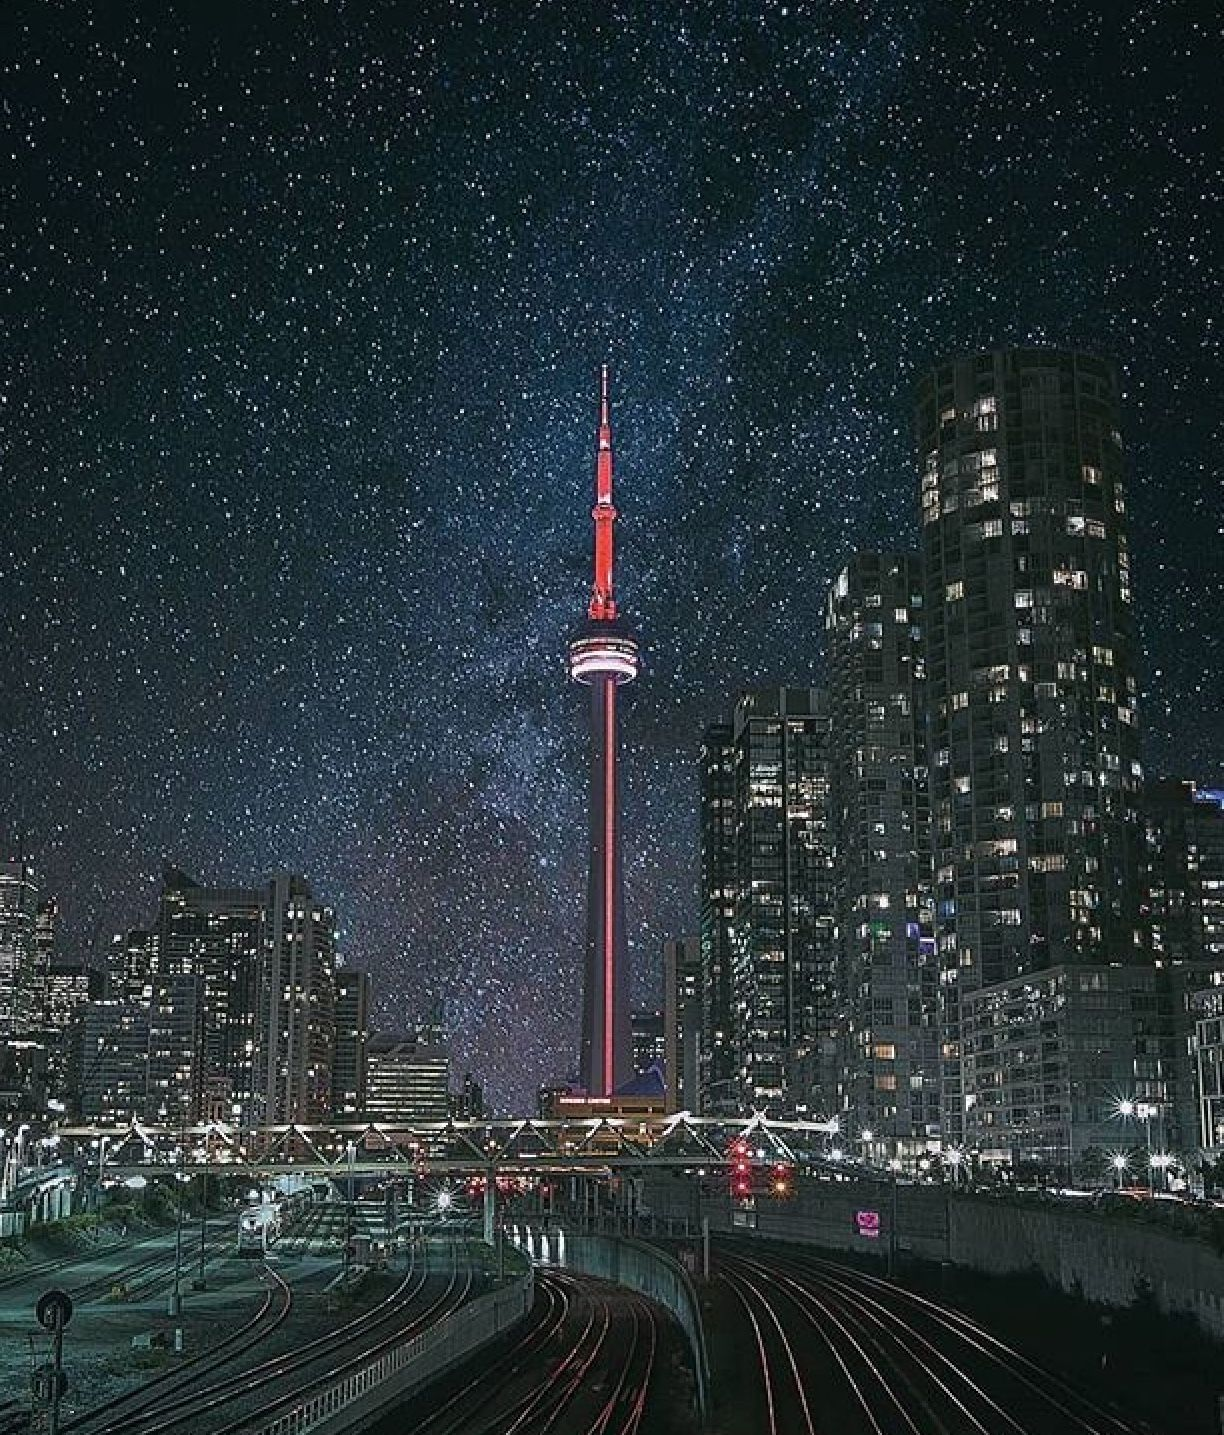 Toronto Toronto Ontario Canada Toronto Photography Toronto Canada